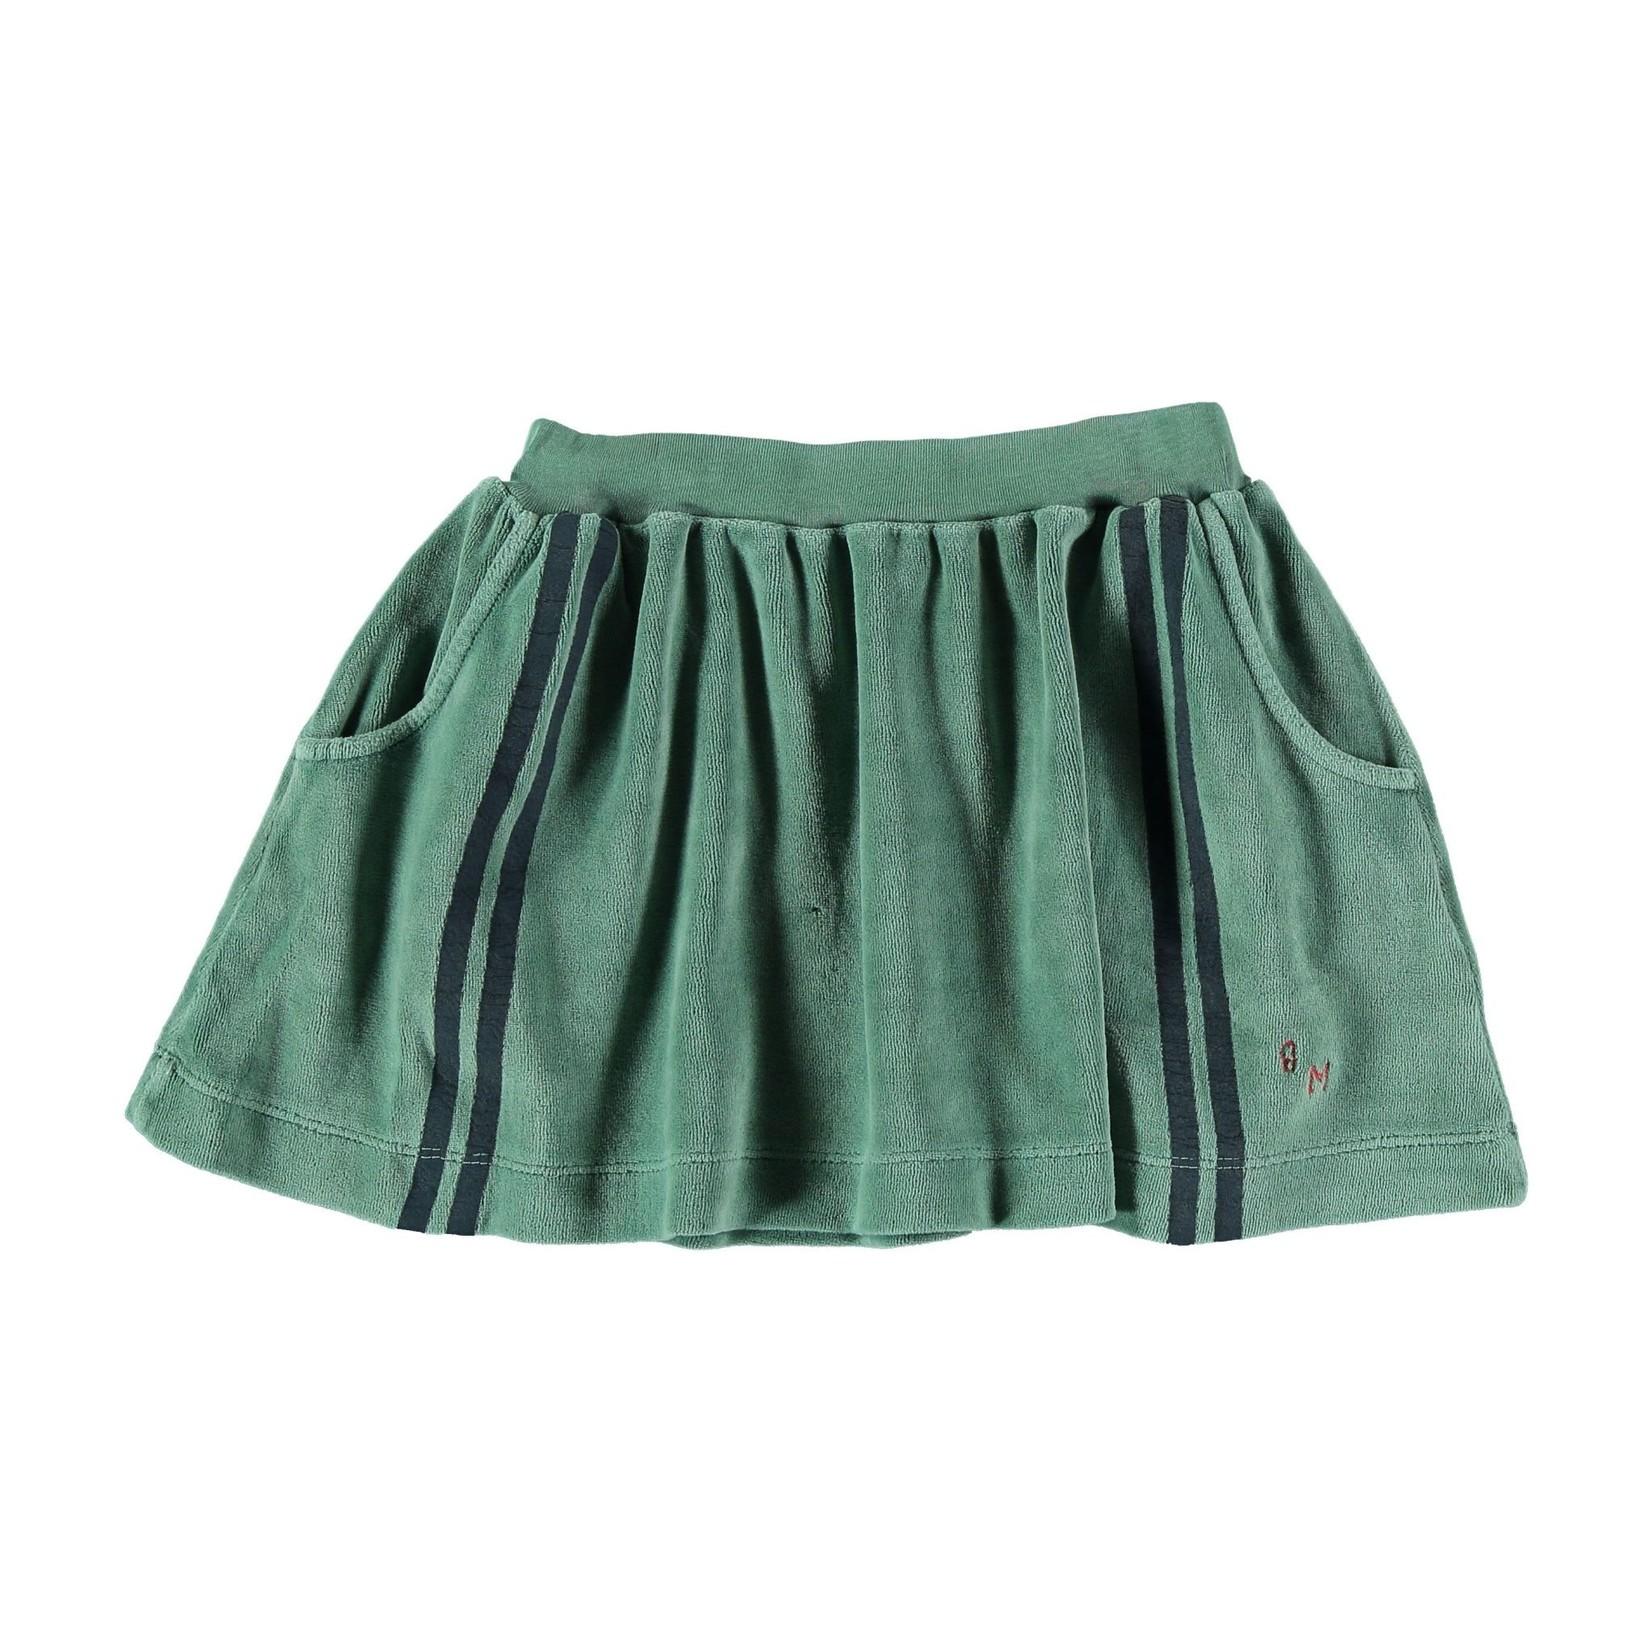 BONMOT BONMOT organic  Mini skirt side stripes